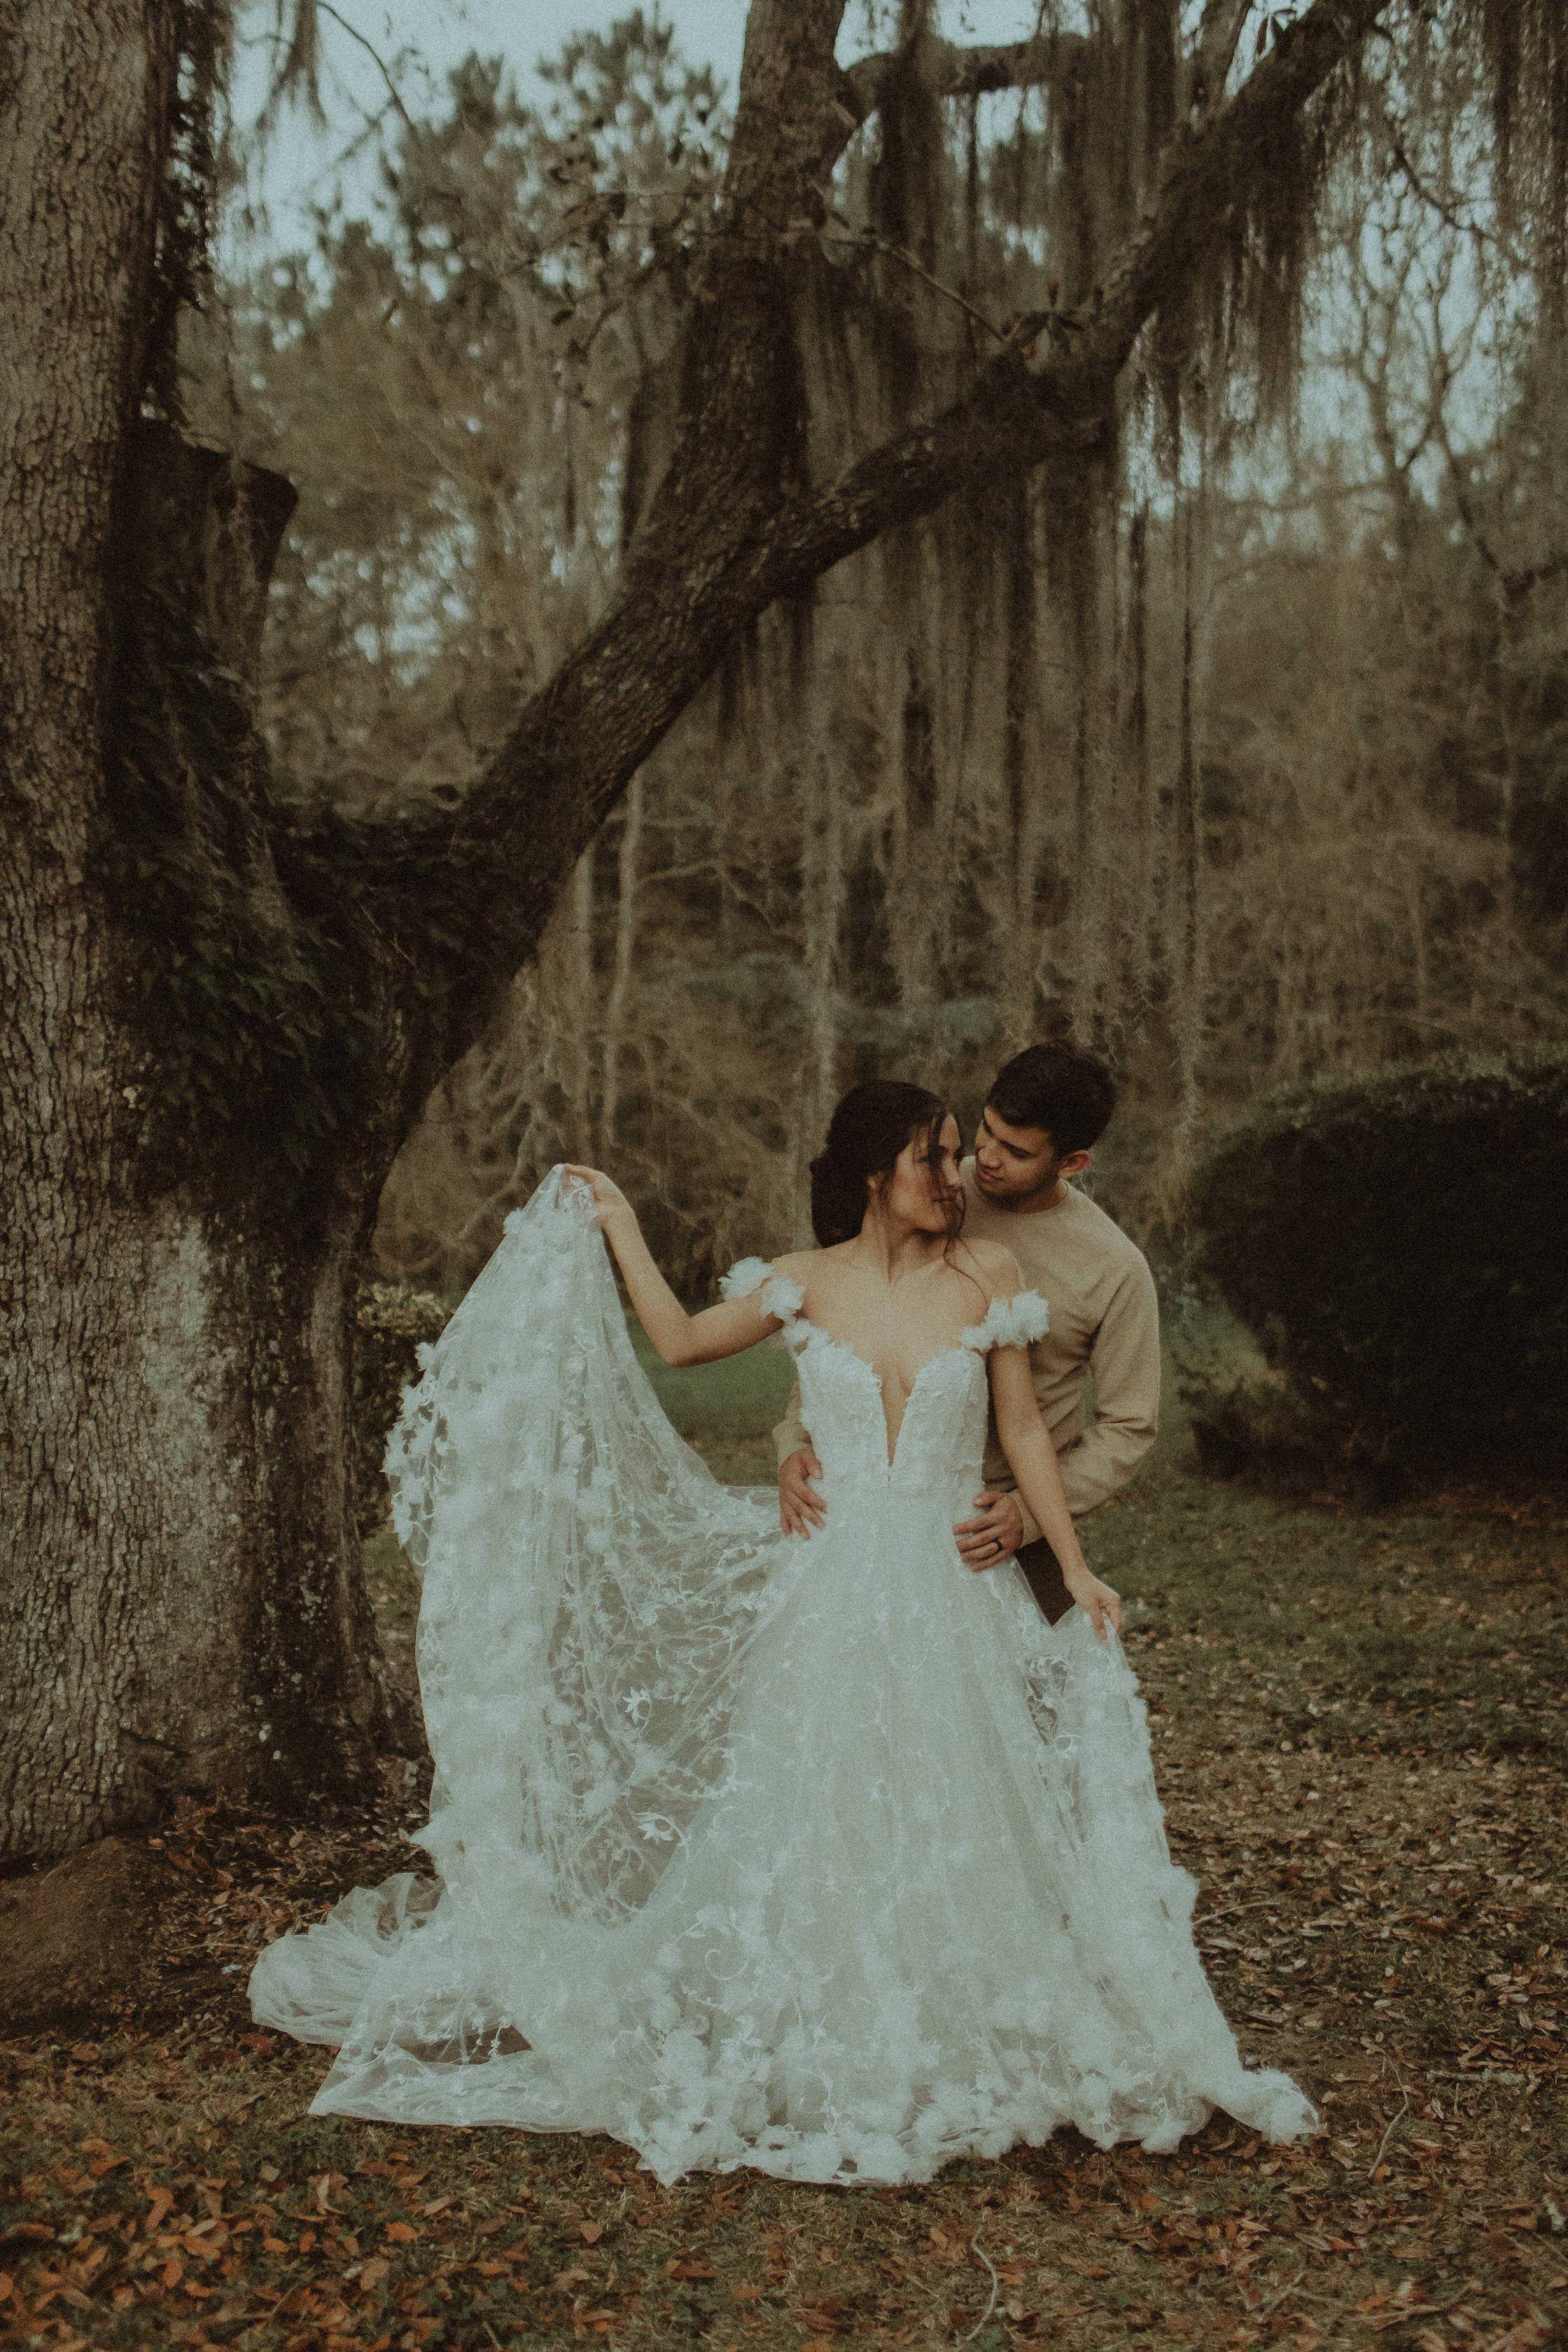 New Orleans Wedding Workshop Eunice Beck In 2020 Louisiana Wedding New Orleans Wedding Bridal Photoshoot